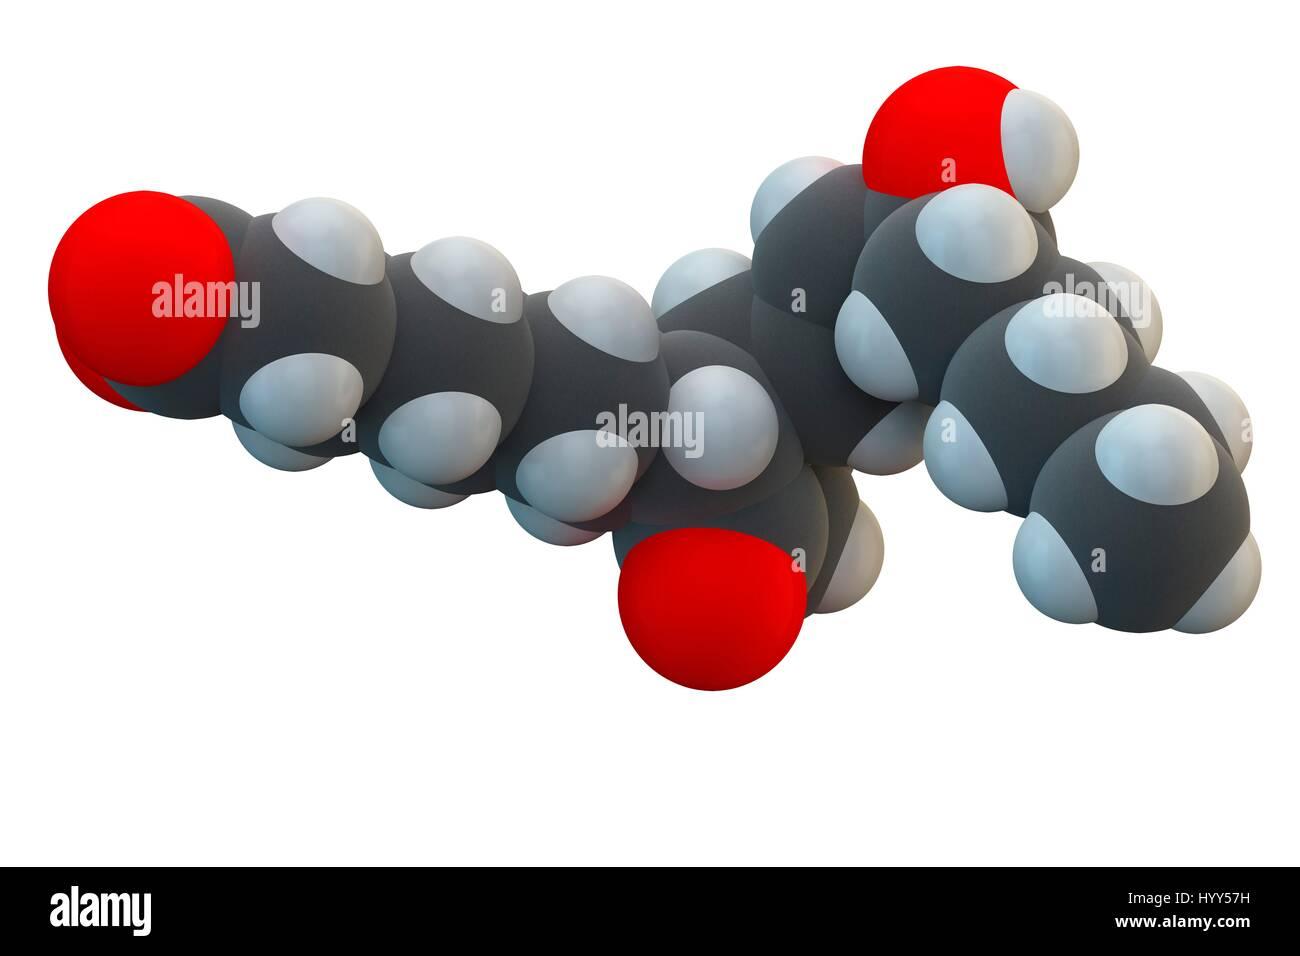 Alprostadil (prostaglandin E1) erectile dysfunction drug molecule. Chemical formula is C20H34O5. Atoms are represented - Stock Image